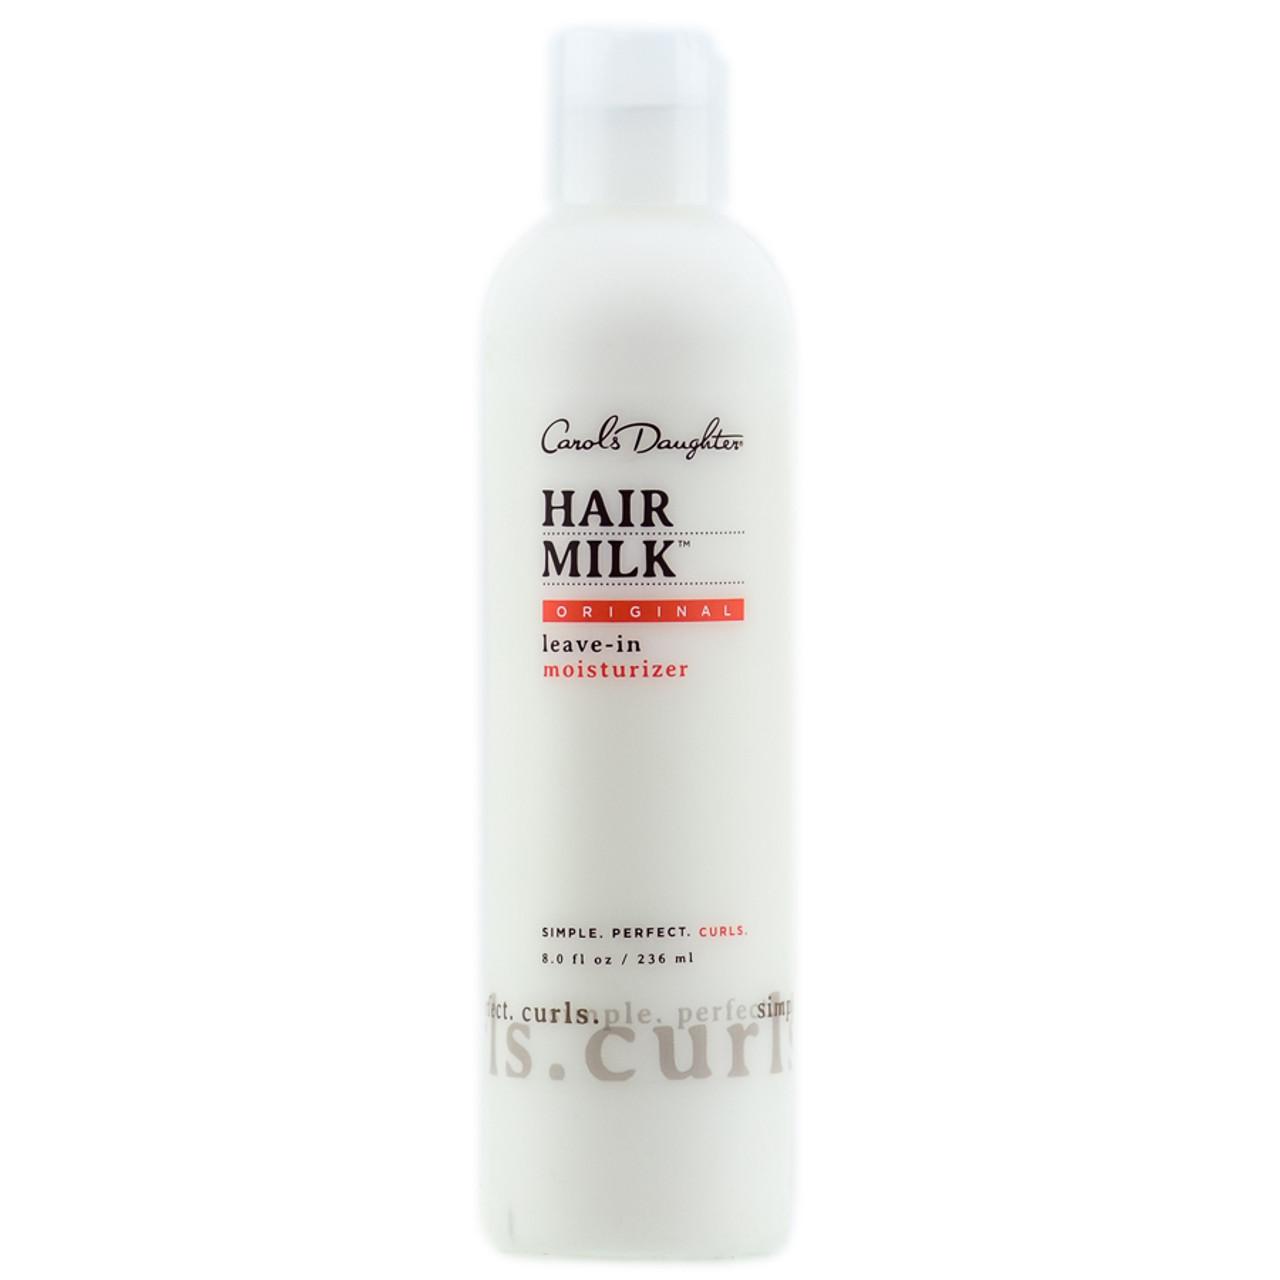 Carol's Daughter Hair Milk Original Leave In Moisturizer - SleekShop.com (formerly Sleekhair)